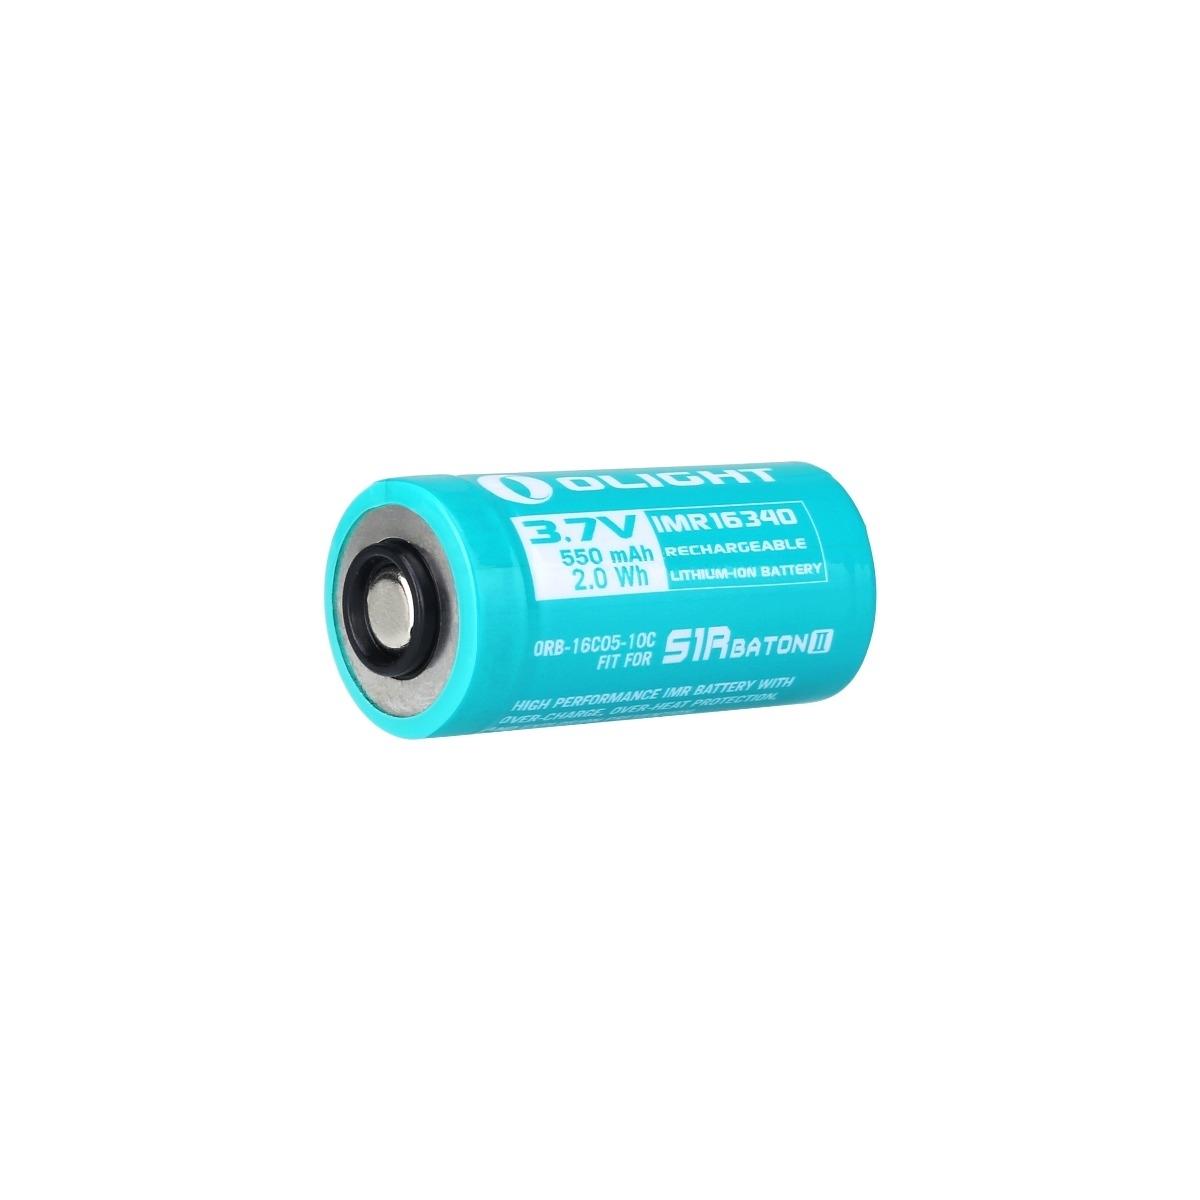 Olight 16340 550 mAh IMR Batteria per S1R Baton II / Perun Mini